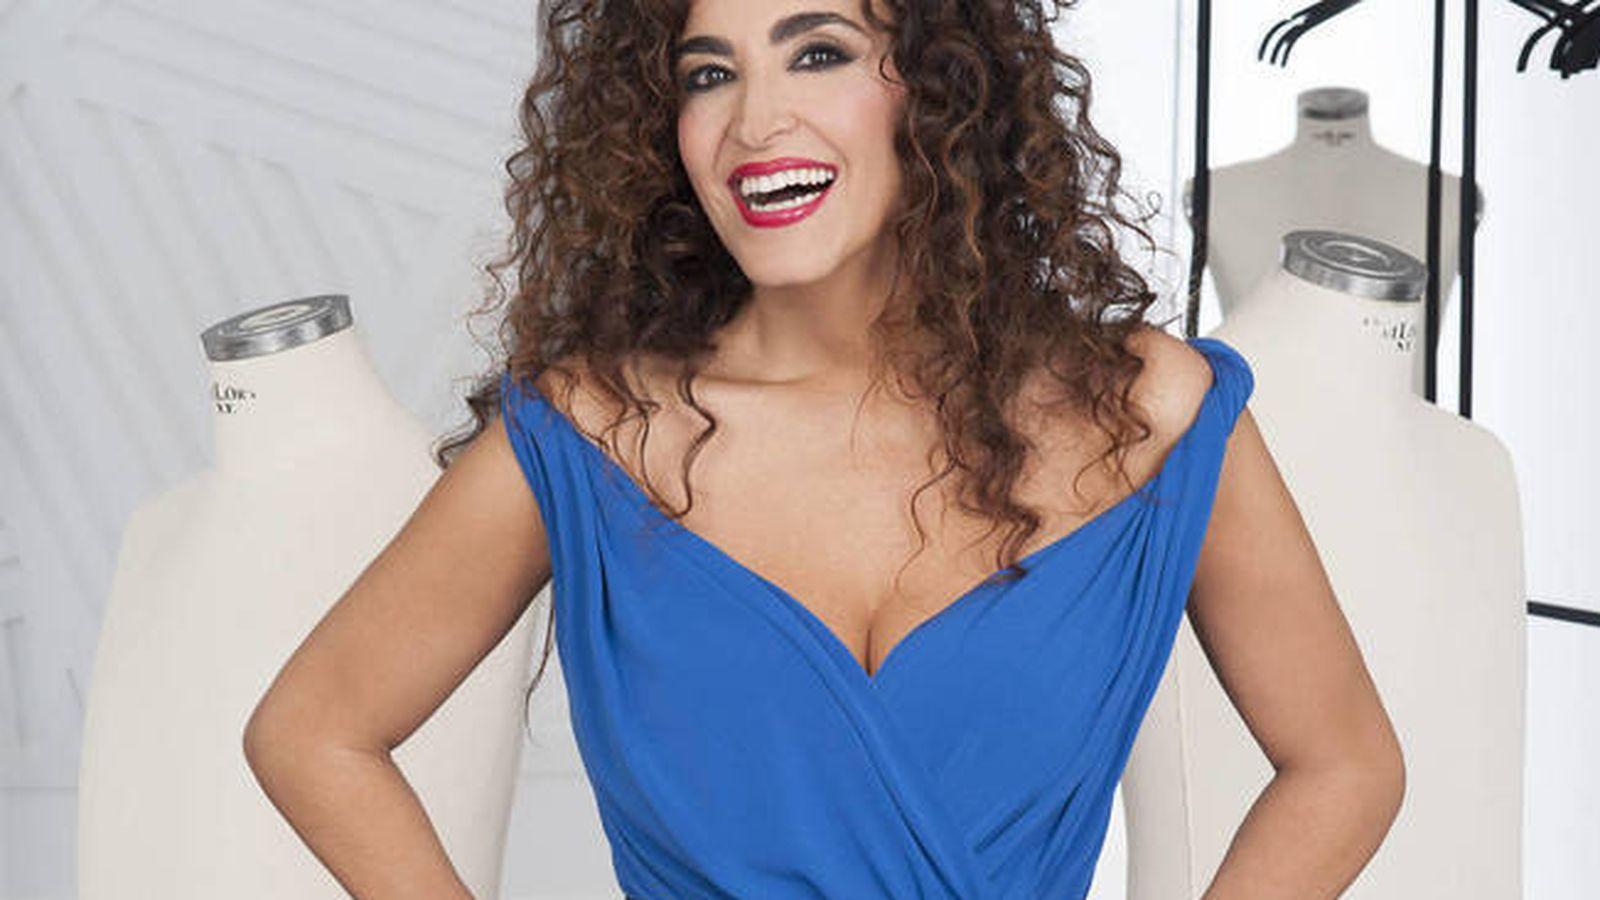 Cristina Rodriguez nudes (95 foto and video), Pussy, Bikini, Twitter, legs 2019